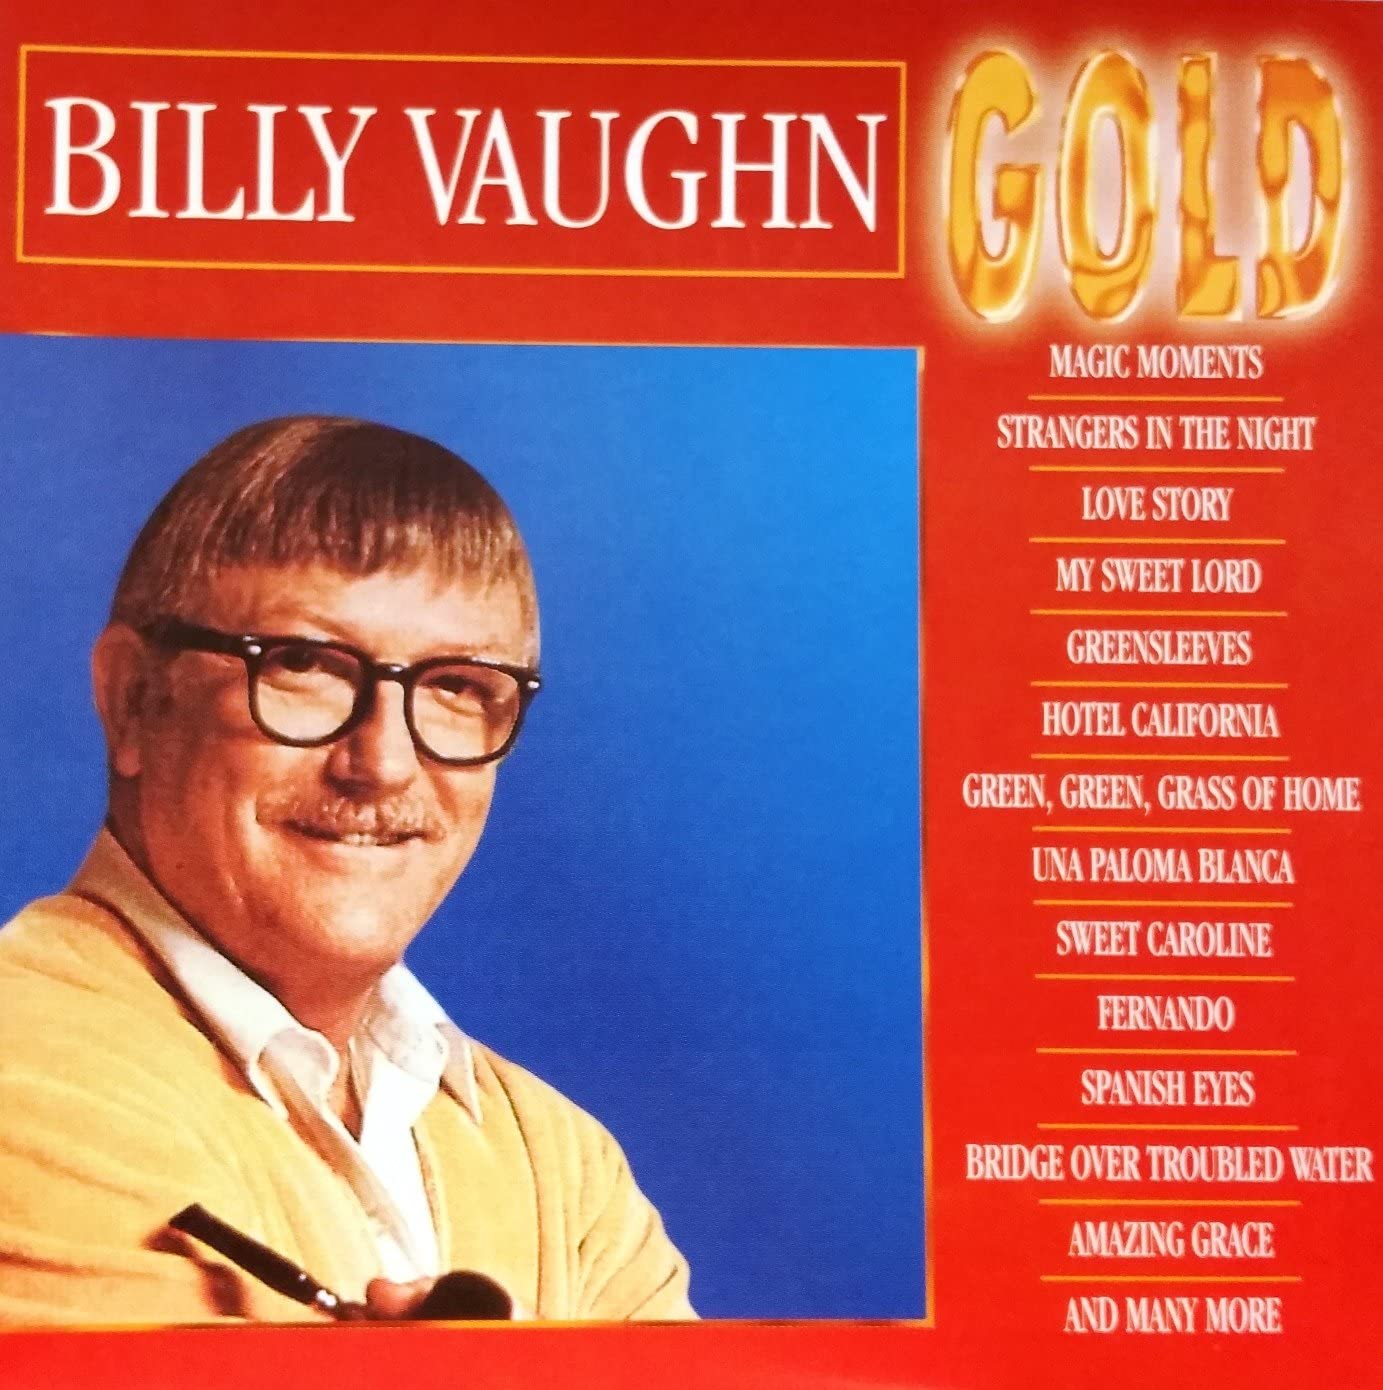 BILLY VAUGHN - GOLD (CD)